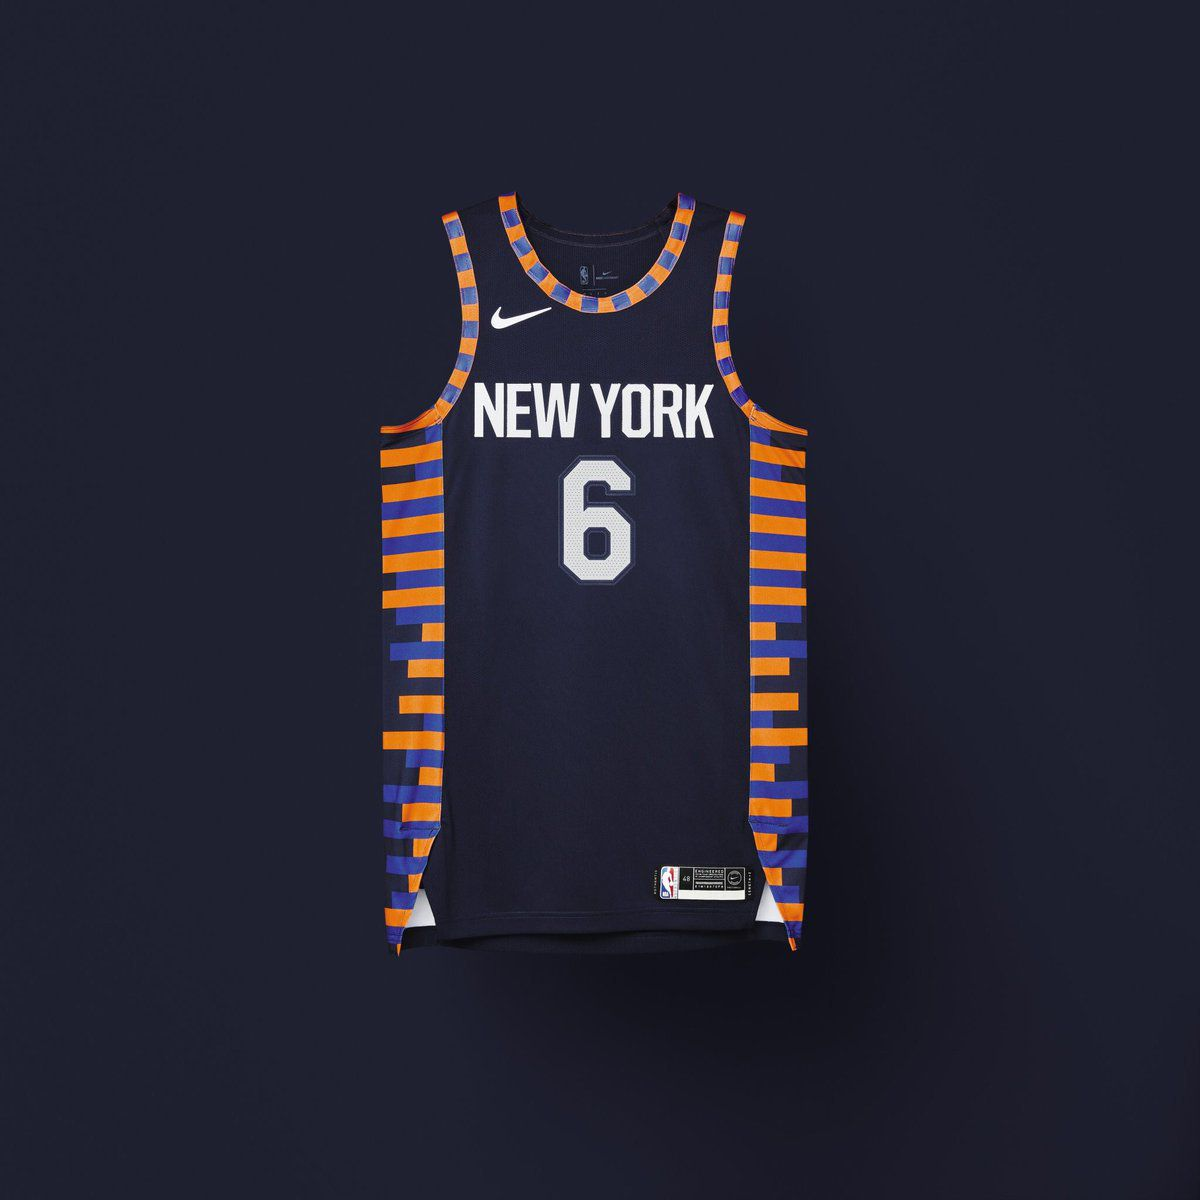 new arrival 8a47e d0a08 Every NBA City Edition jersey, ranked - SBNation.com